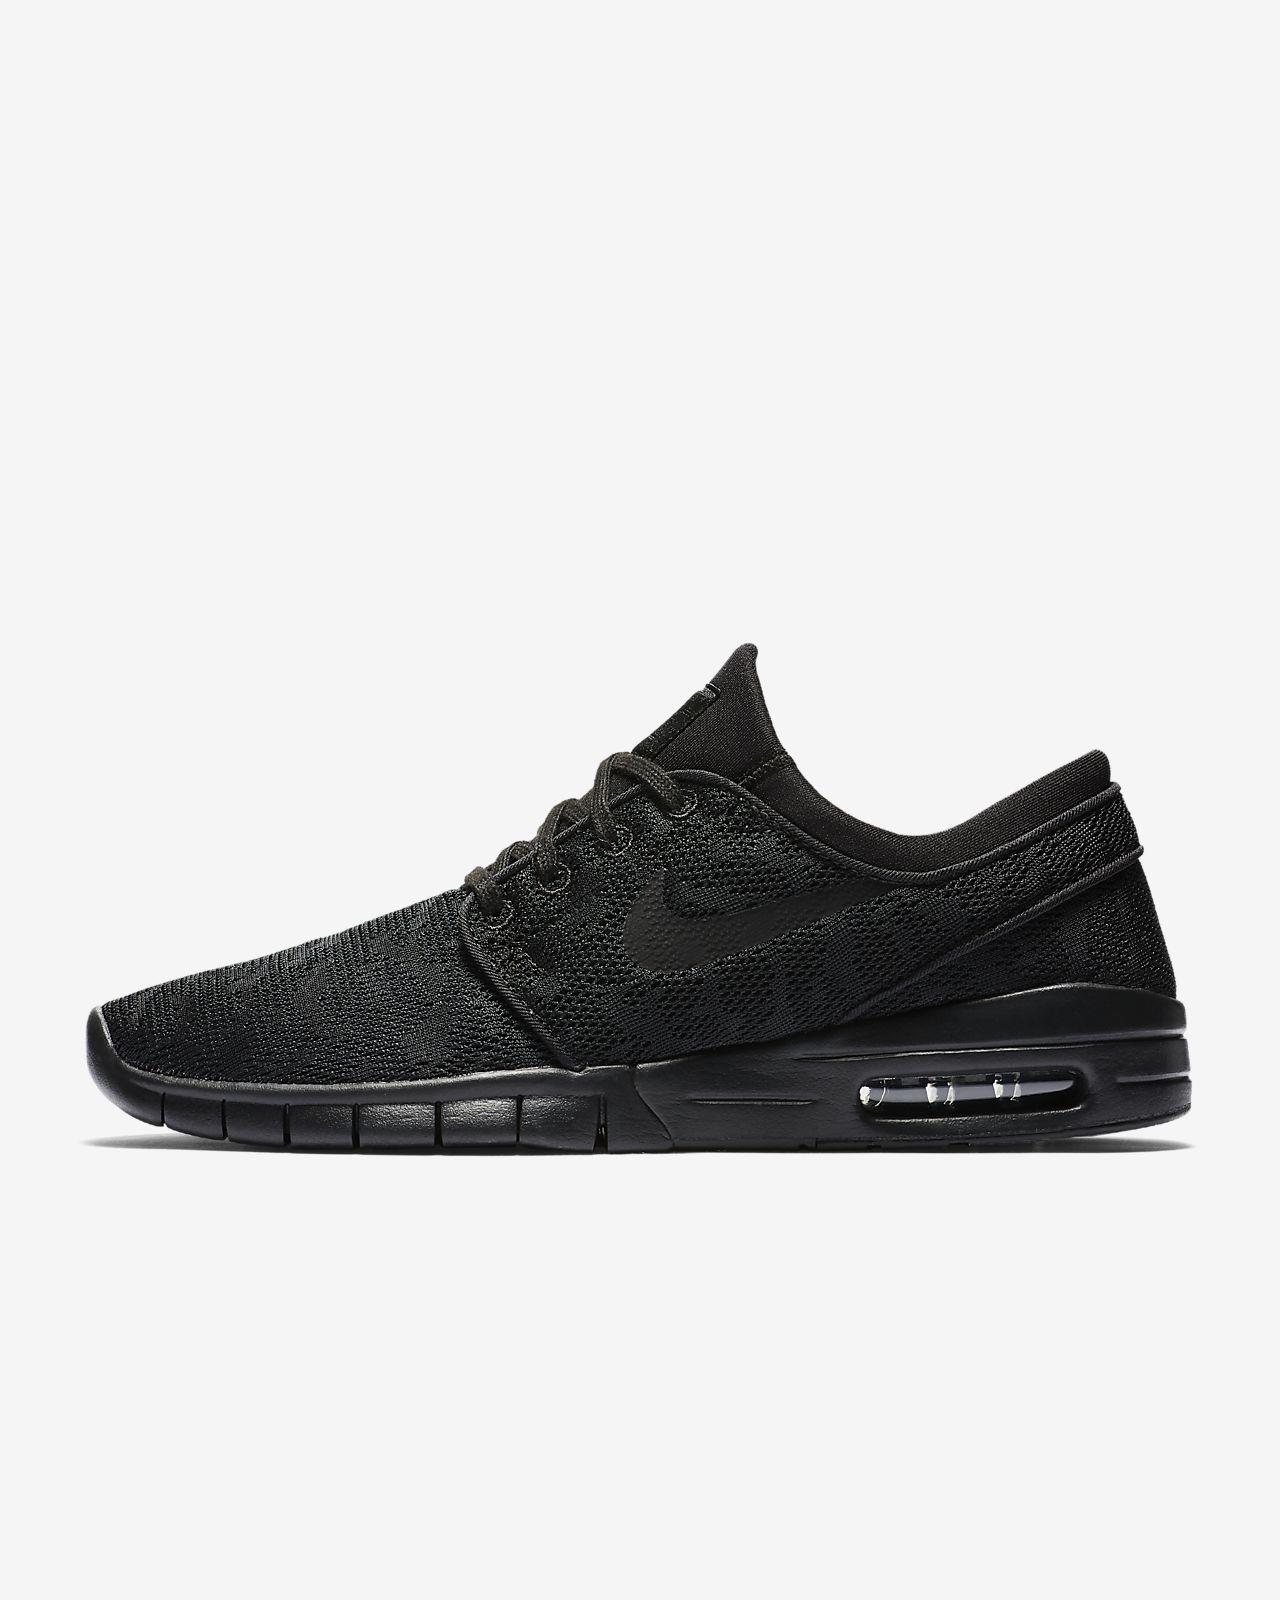 4da74e2a48b Nike SB Stefan Janoski Max Skate Shoe. Nike.com GB